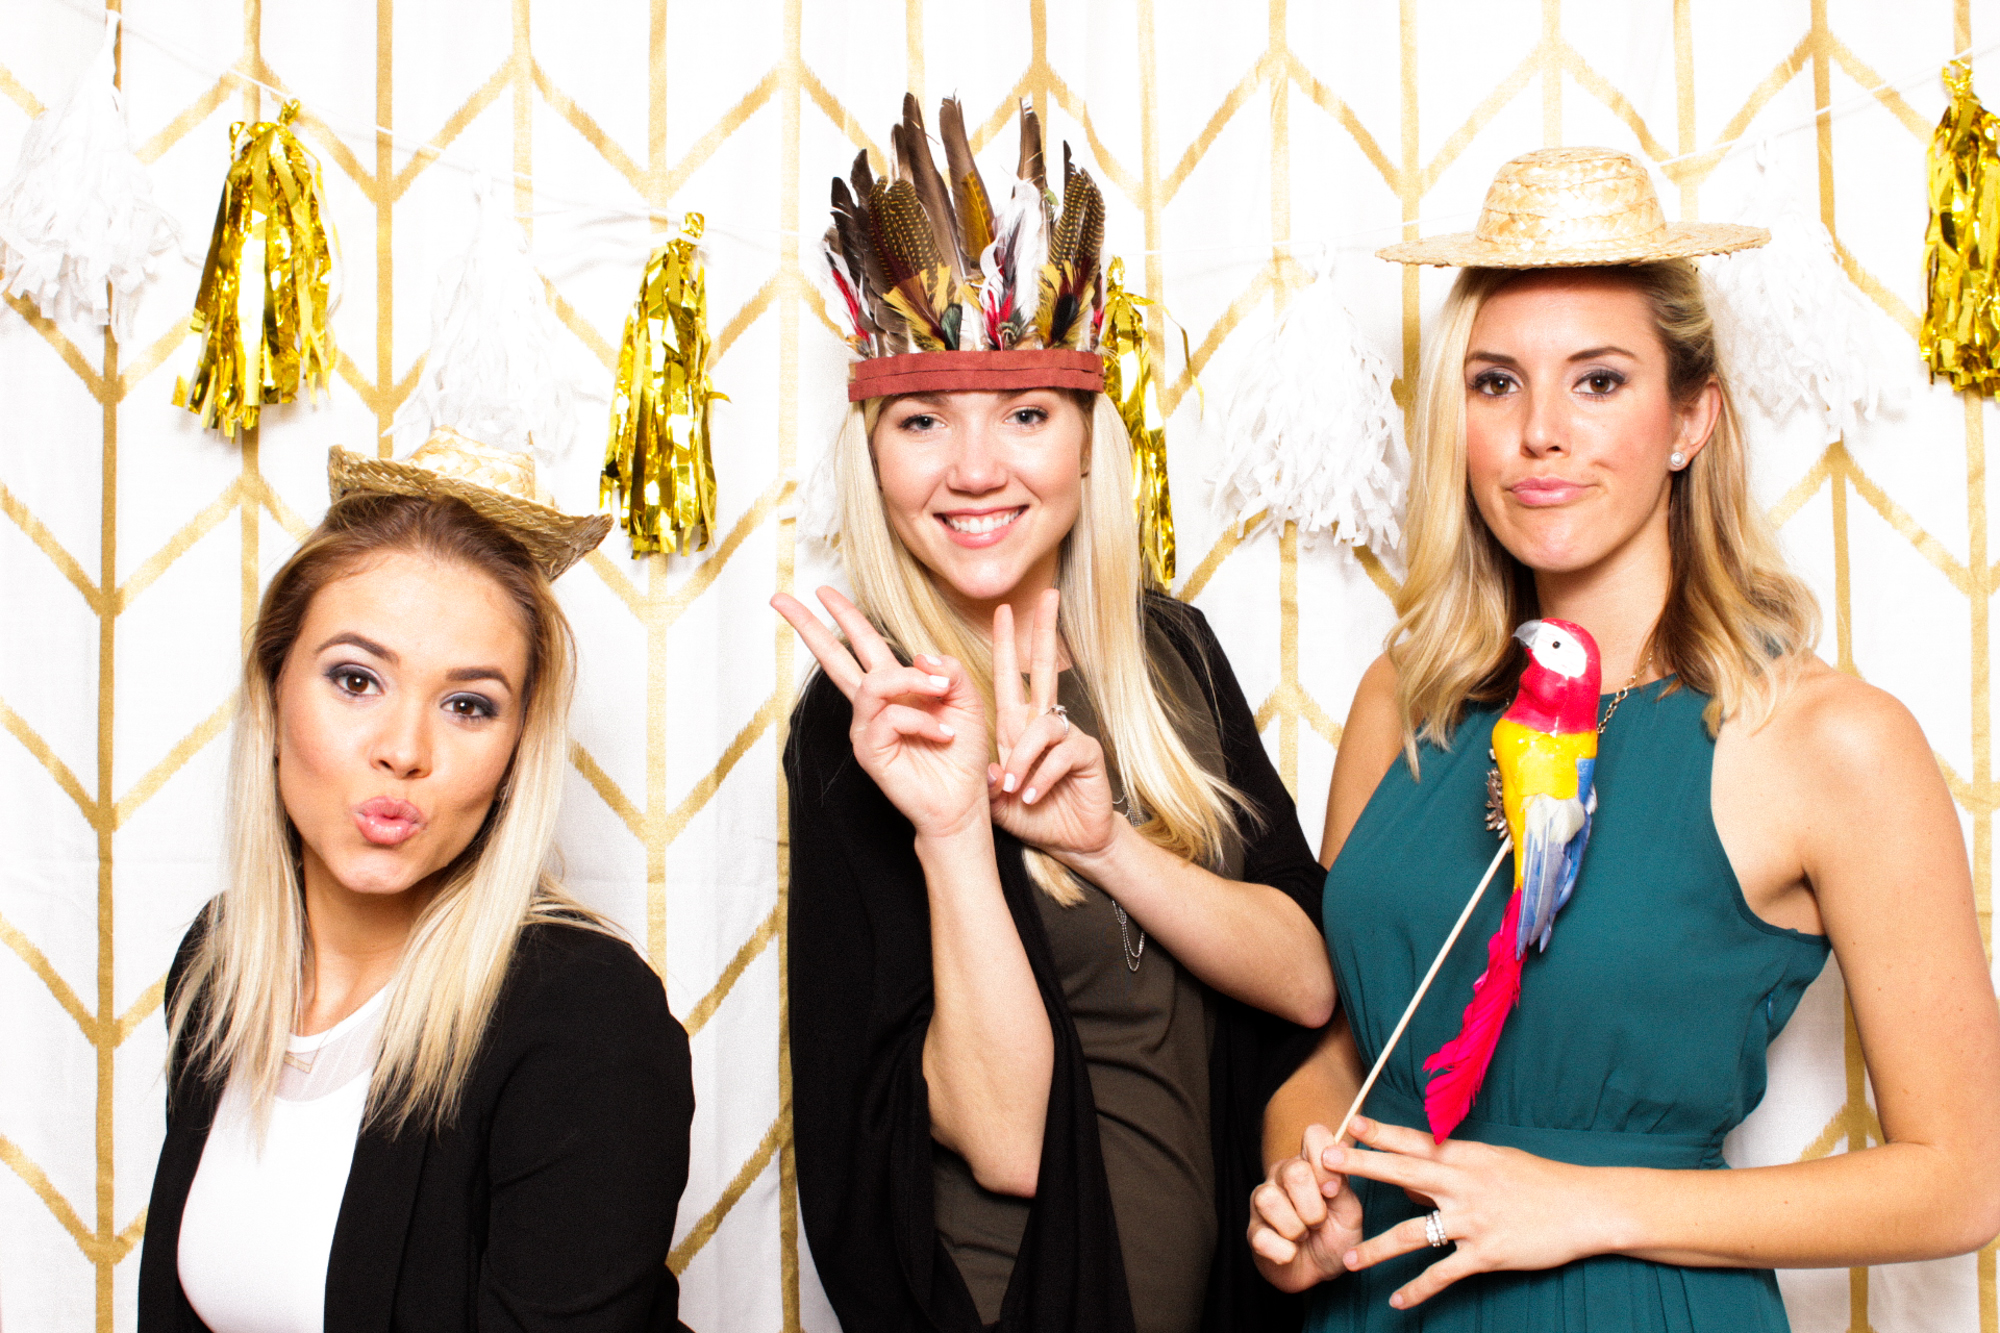 The_Reverie_Booth-Naples_Photobooth-Florida_Photobooth_Rental-Wedding_Photobooth-012.jpg